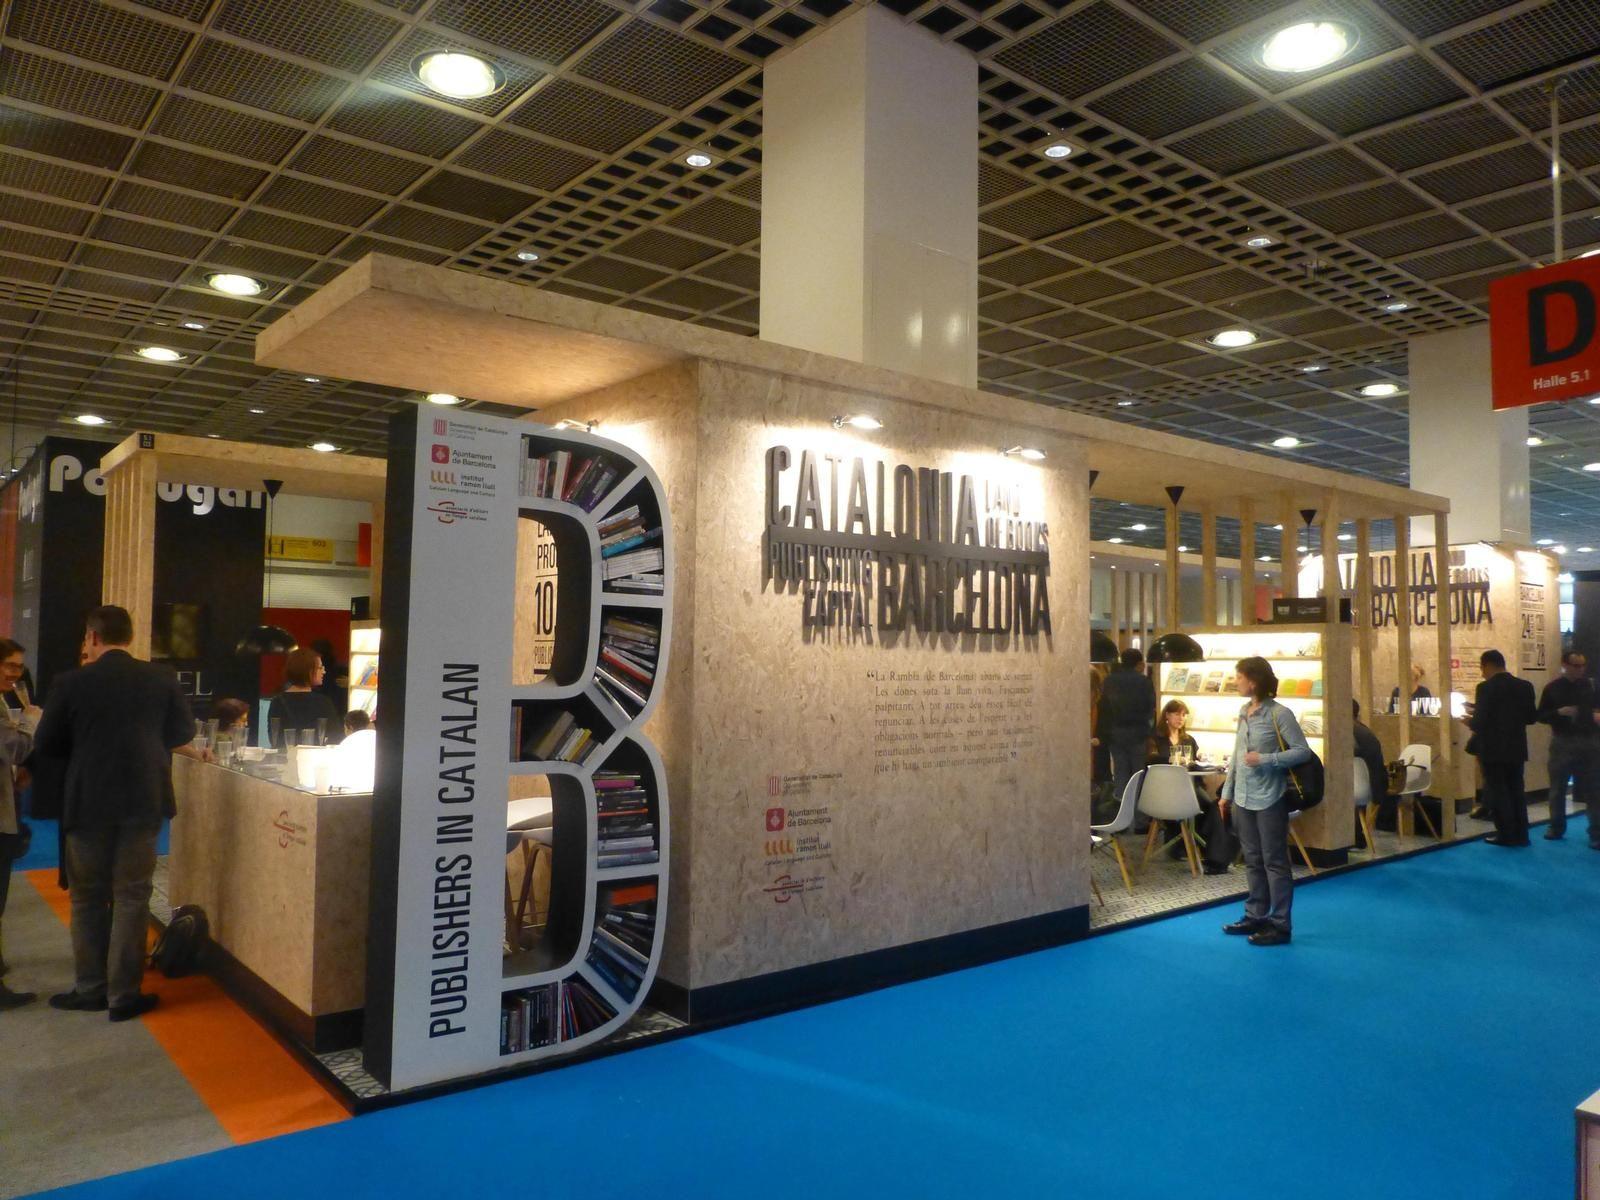 Expo Exhibition Stands Out : Book exhibition stand ile ilgili görsel sonucu